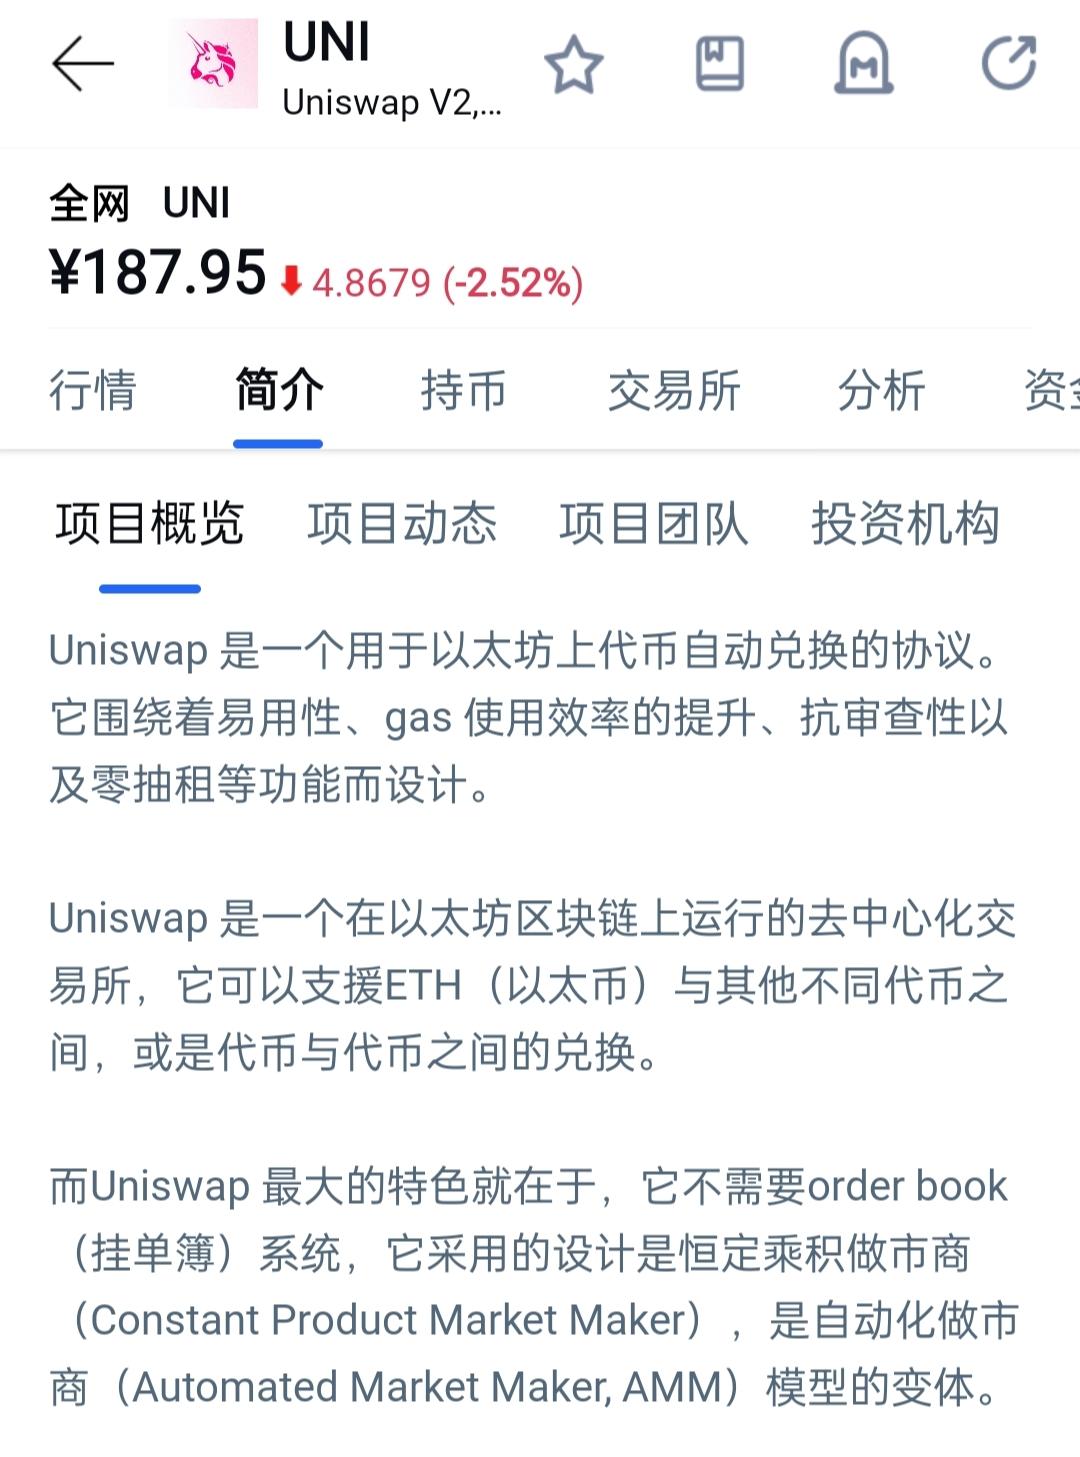 Uniswap Labs遭遇麻烦:蛋叔与火腿杠上了